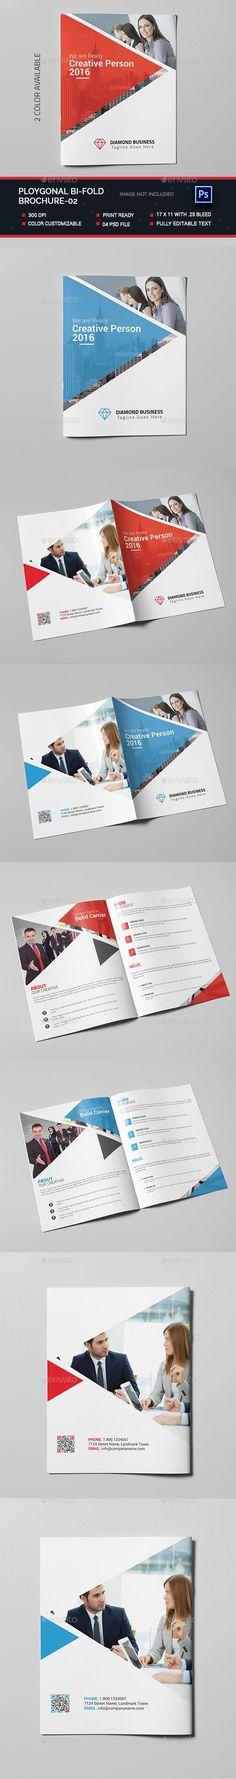 Polygonal Bi-fold Brochure Template PSD #design Download: http://graphicriver.net/item/polygonal-bifold-brochure02/14447169?ref=ksioks